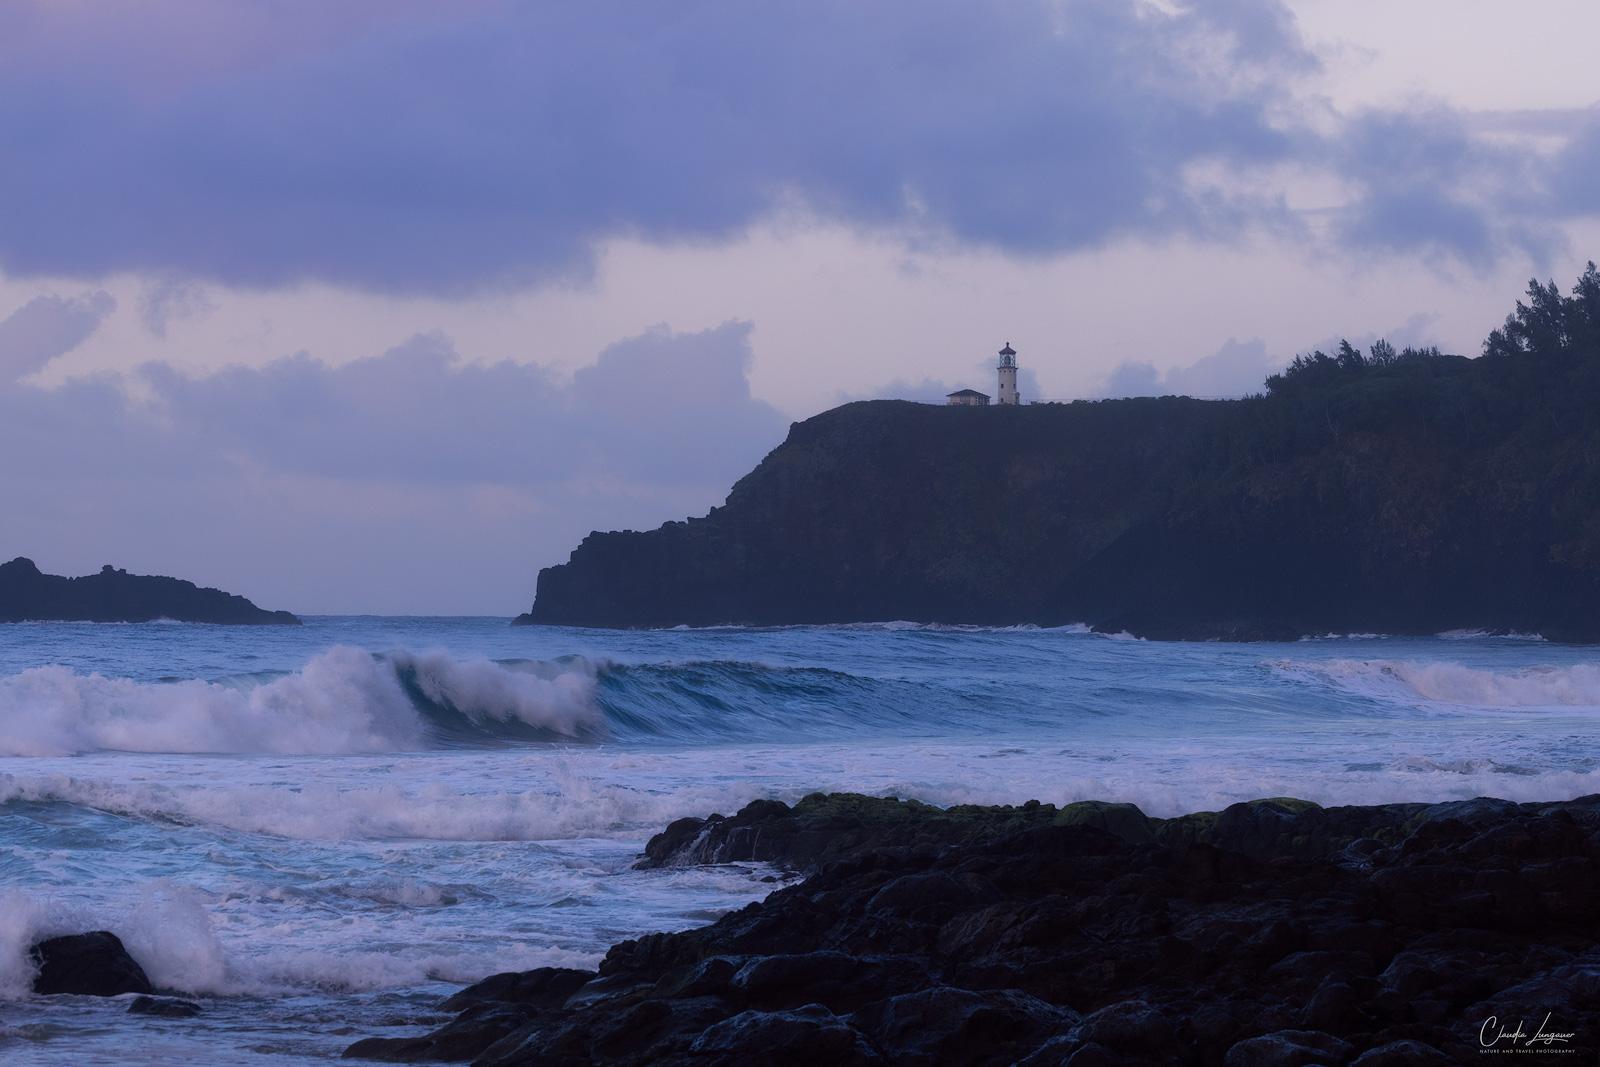 Big waves at Secret Beach on the north shore of Kauai island in Hawaii.